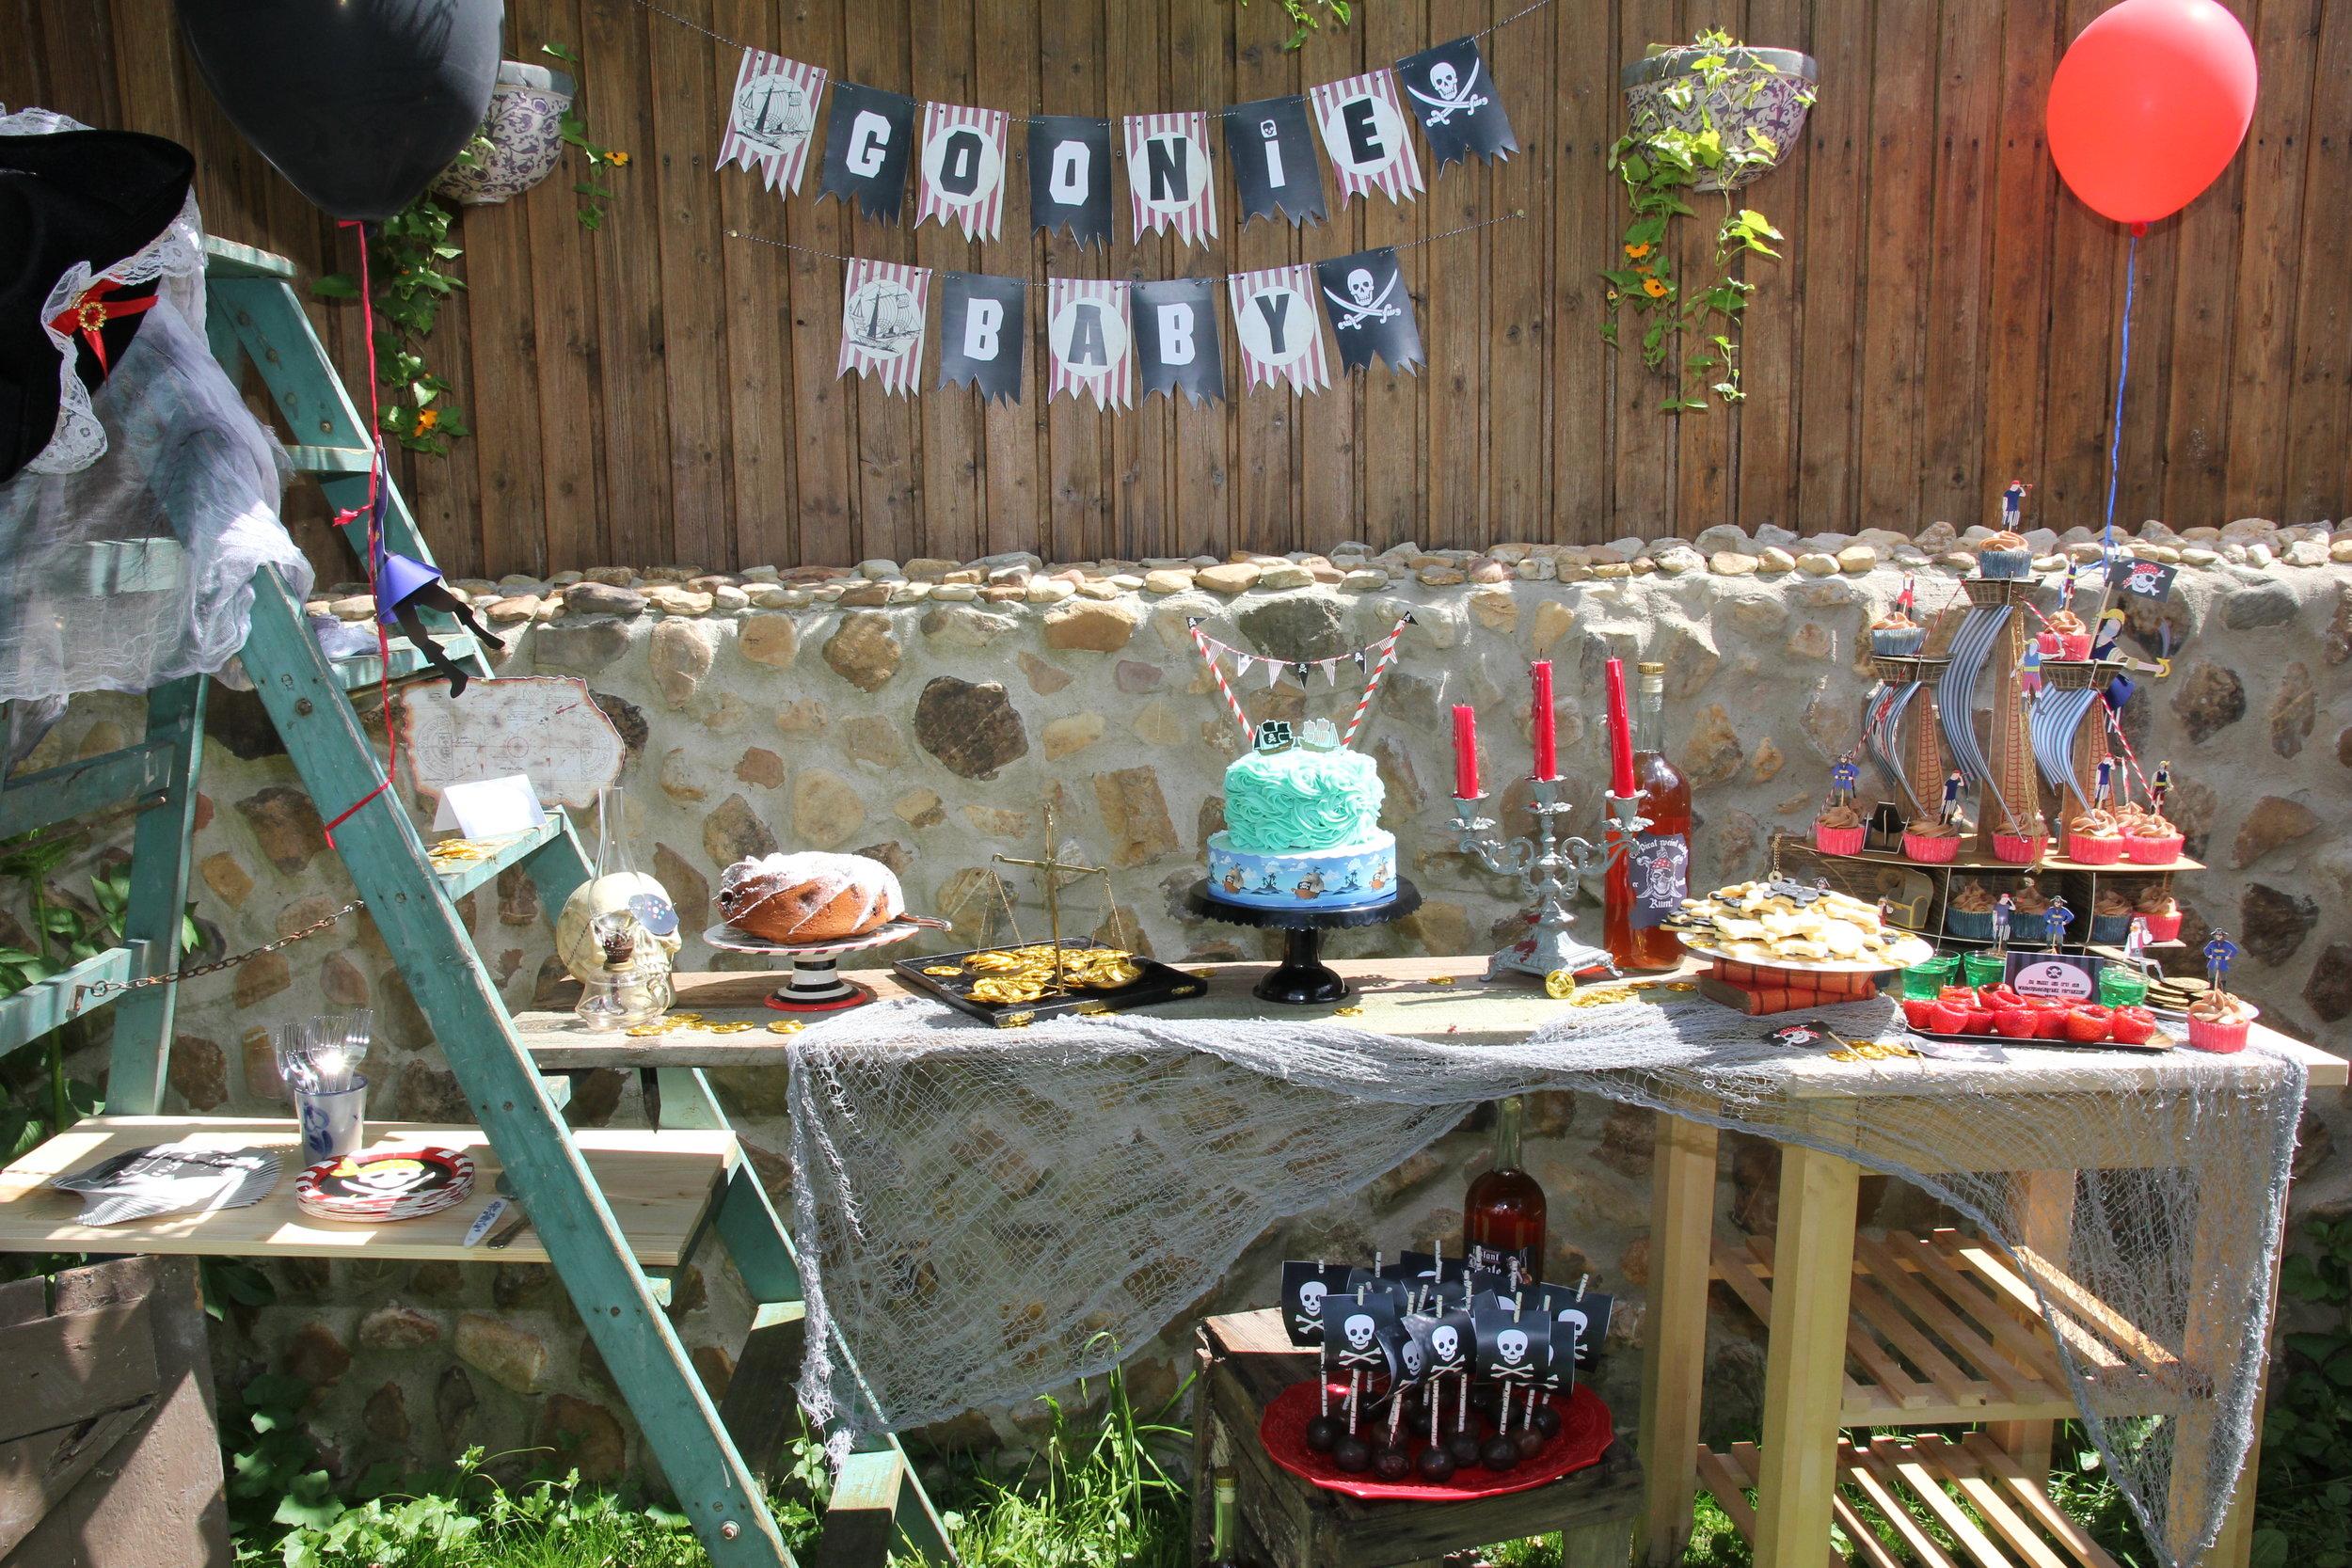 Piraten Goonies Baby Shower Sweet Table.jpg